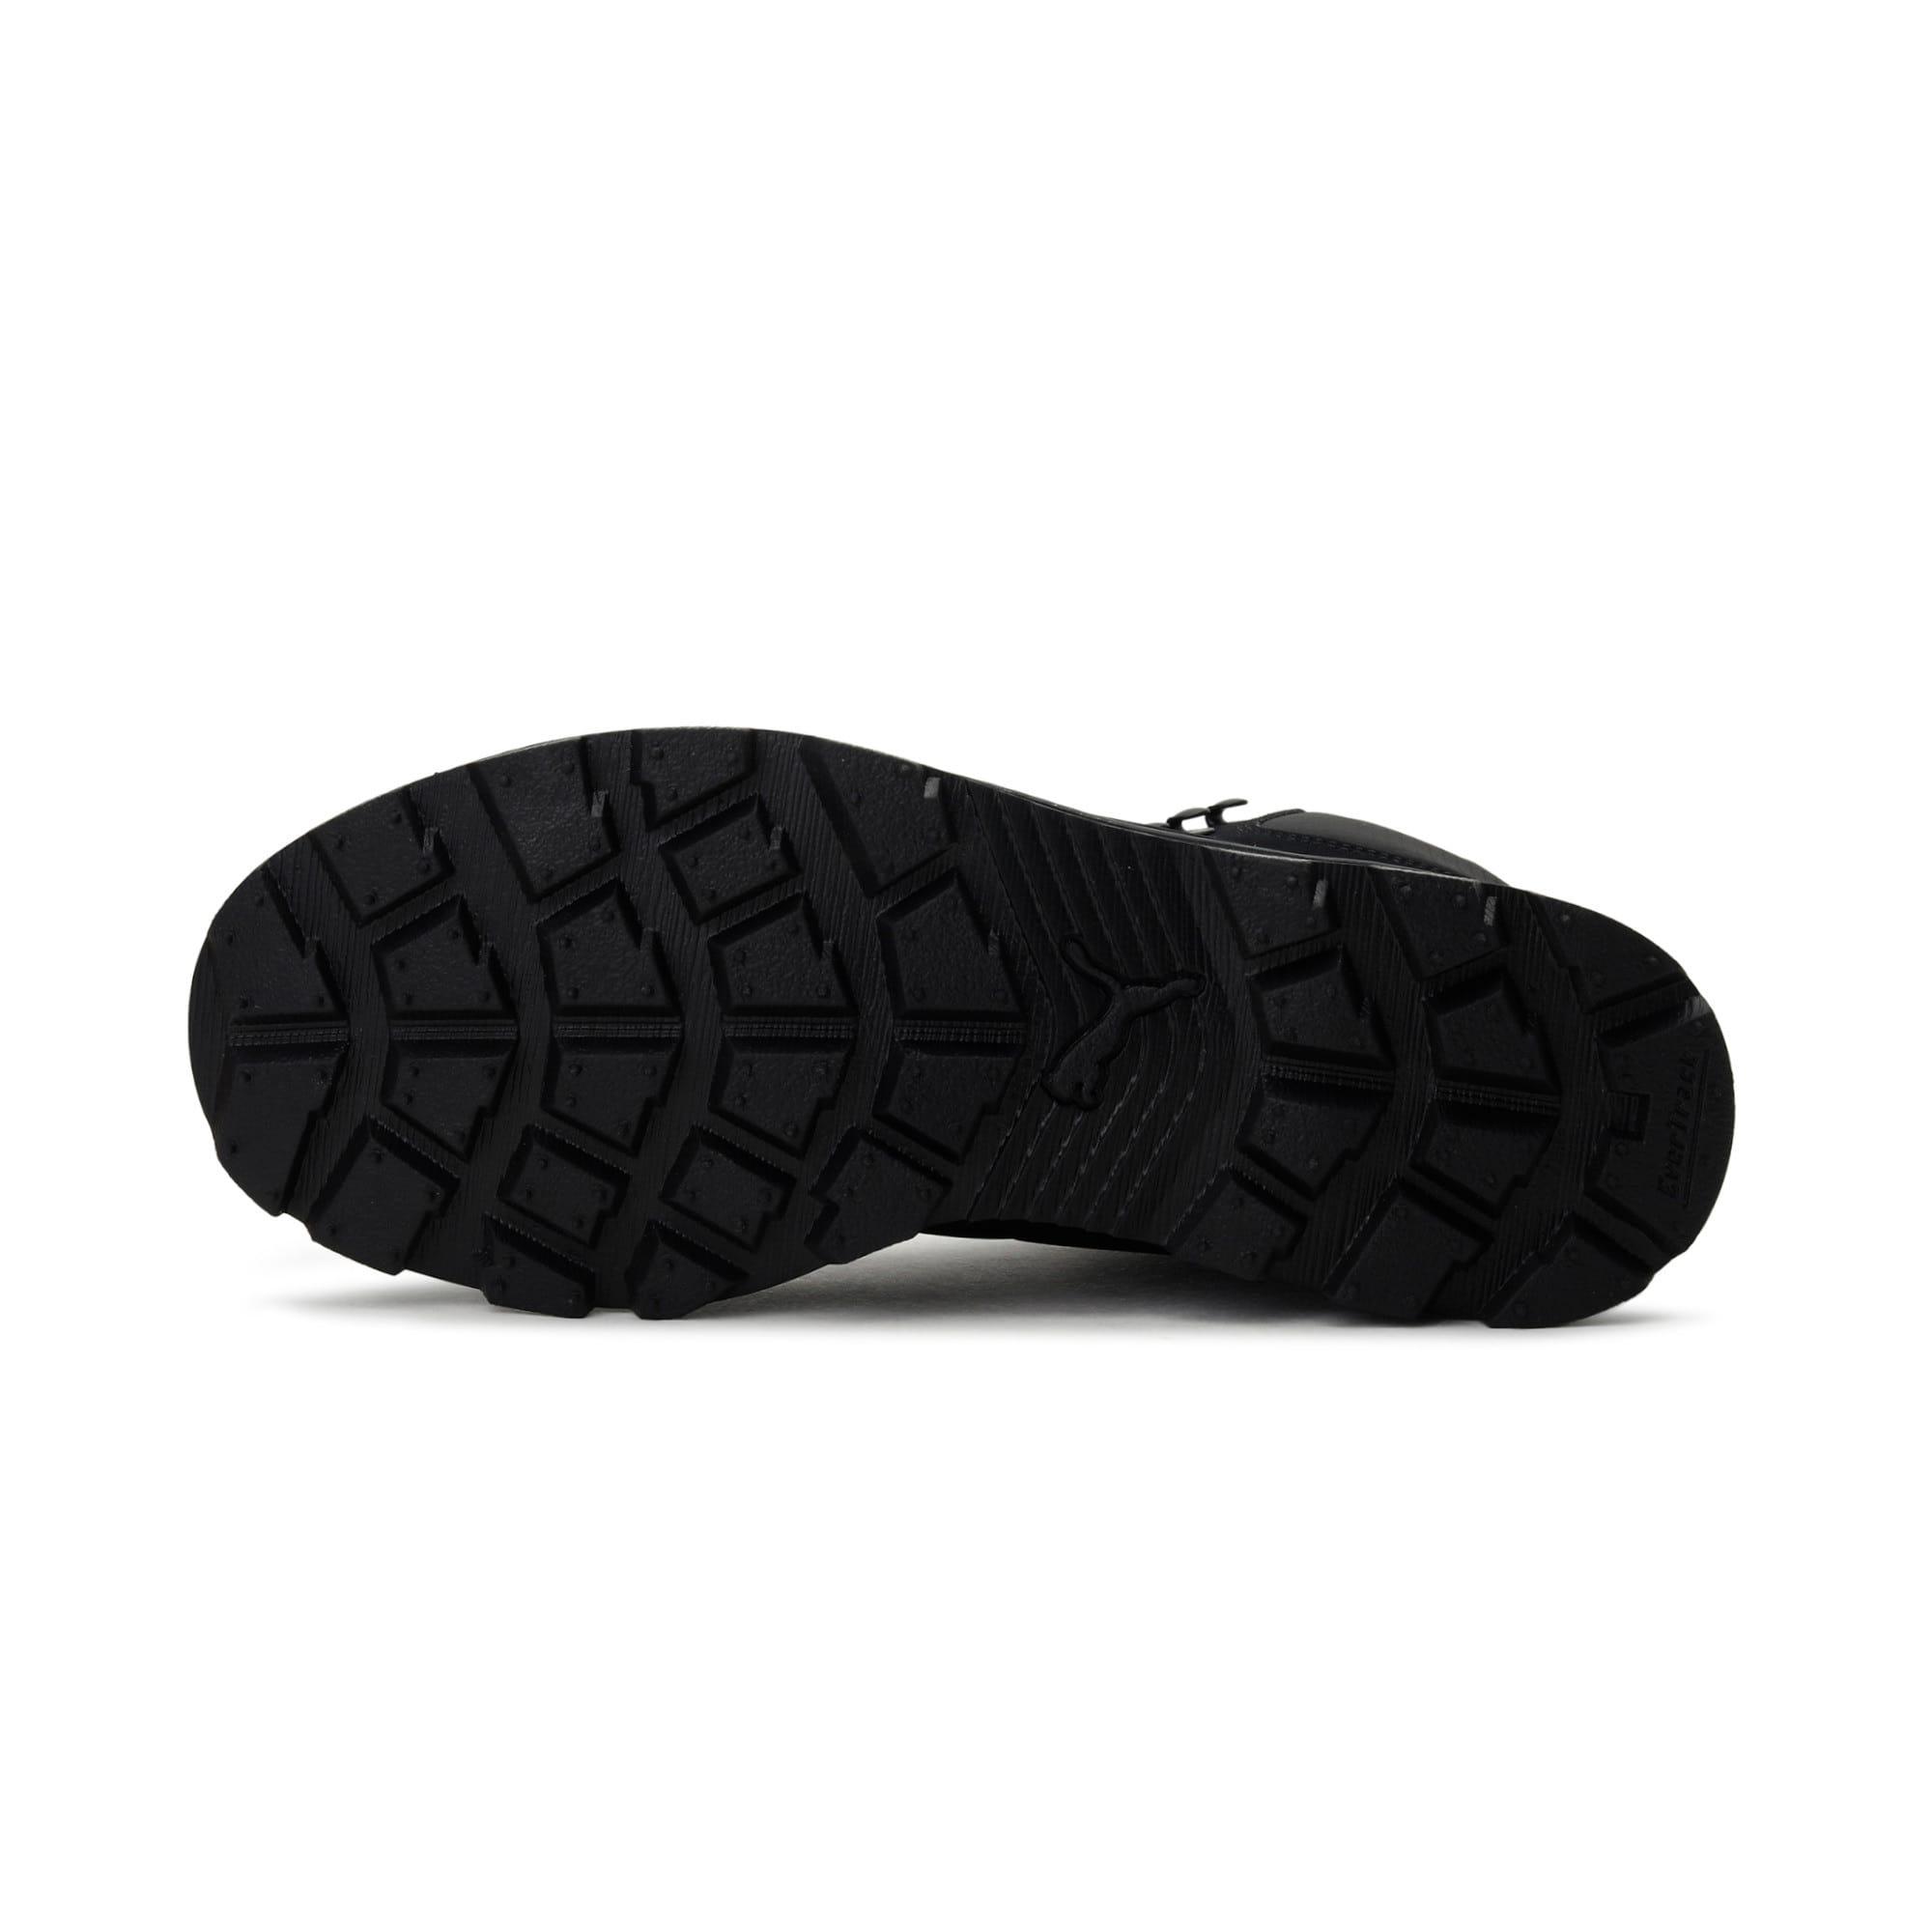 Thumbnail 4 of Desierto Fun Winter Boots, Puma Black- Black- Black, medium-IND